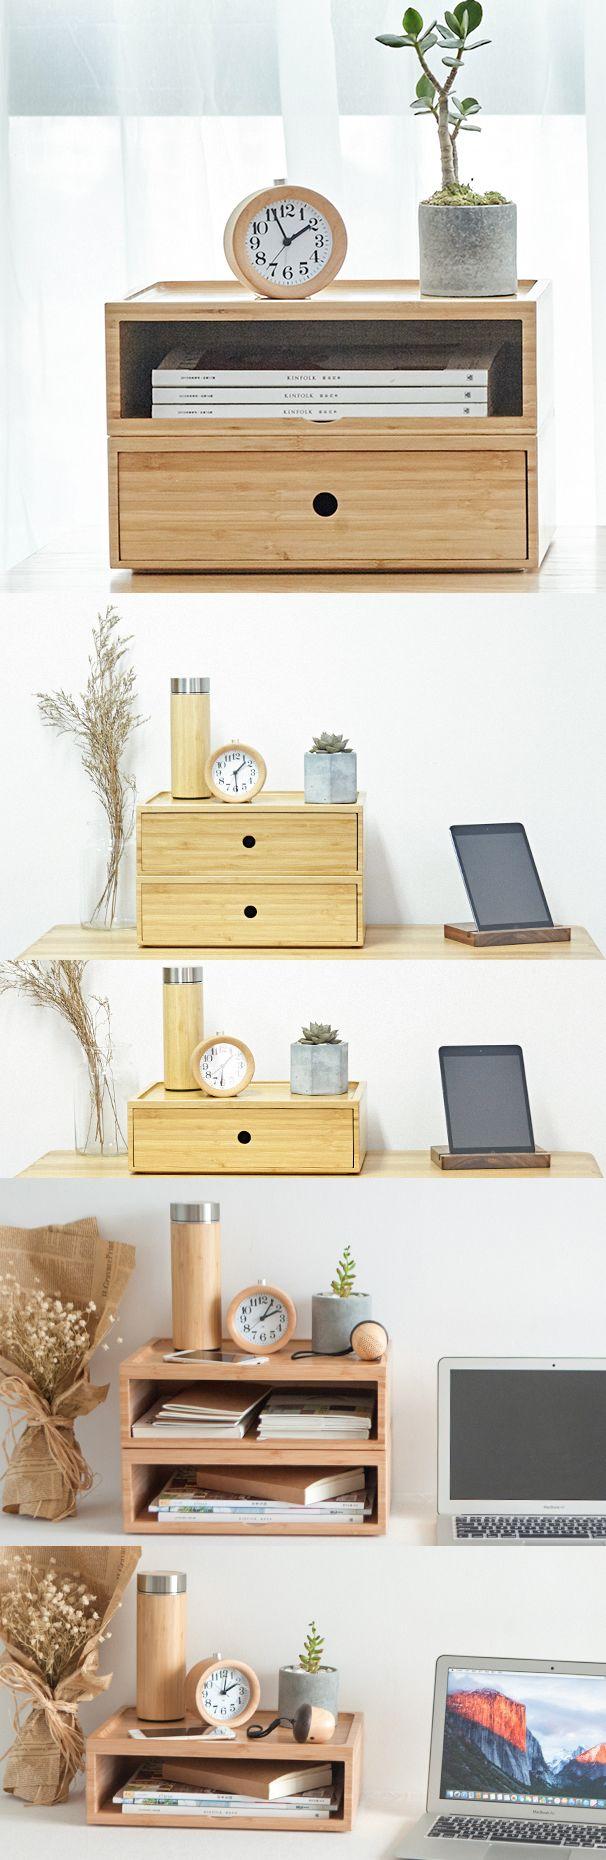 Bamboo Wooden Office Desk Organizer Magazine Letter